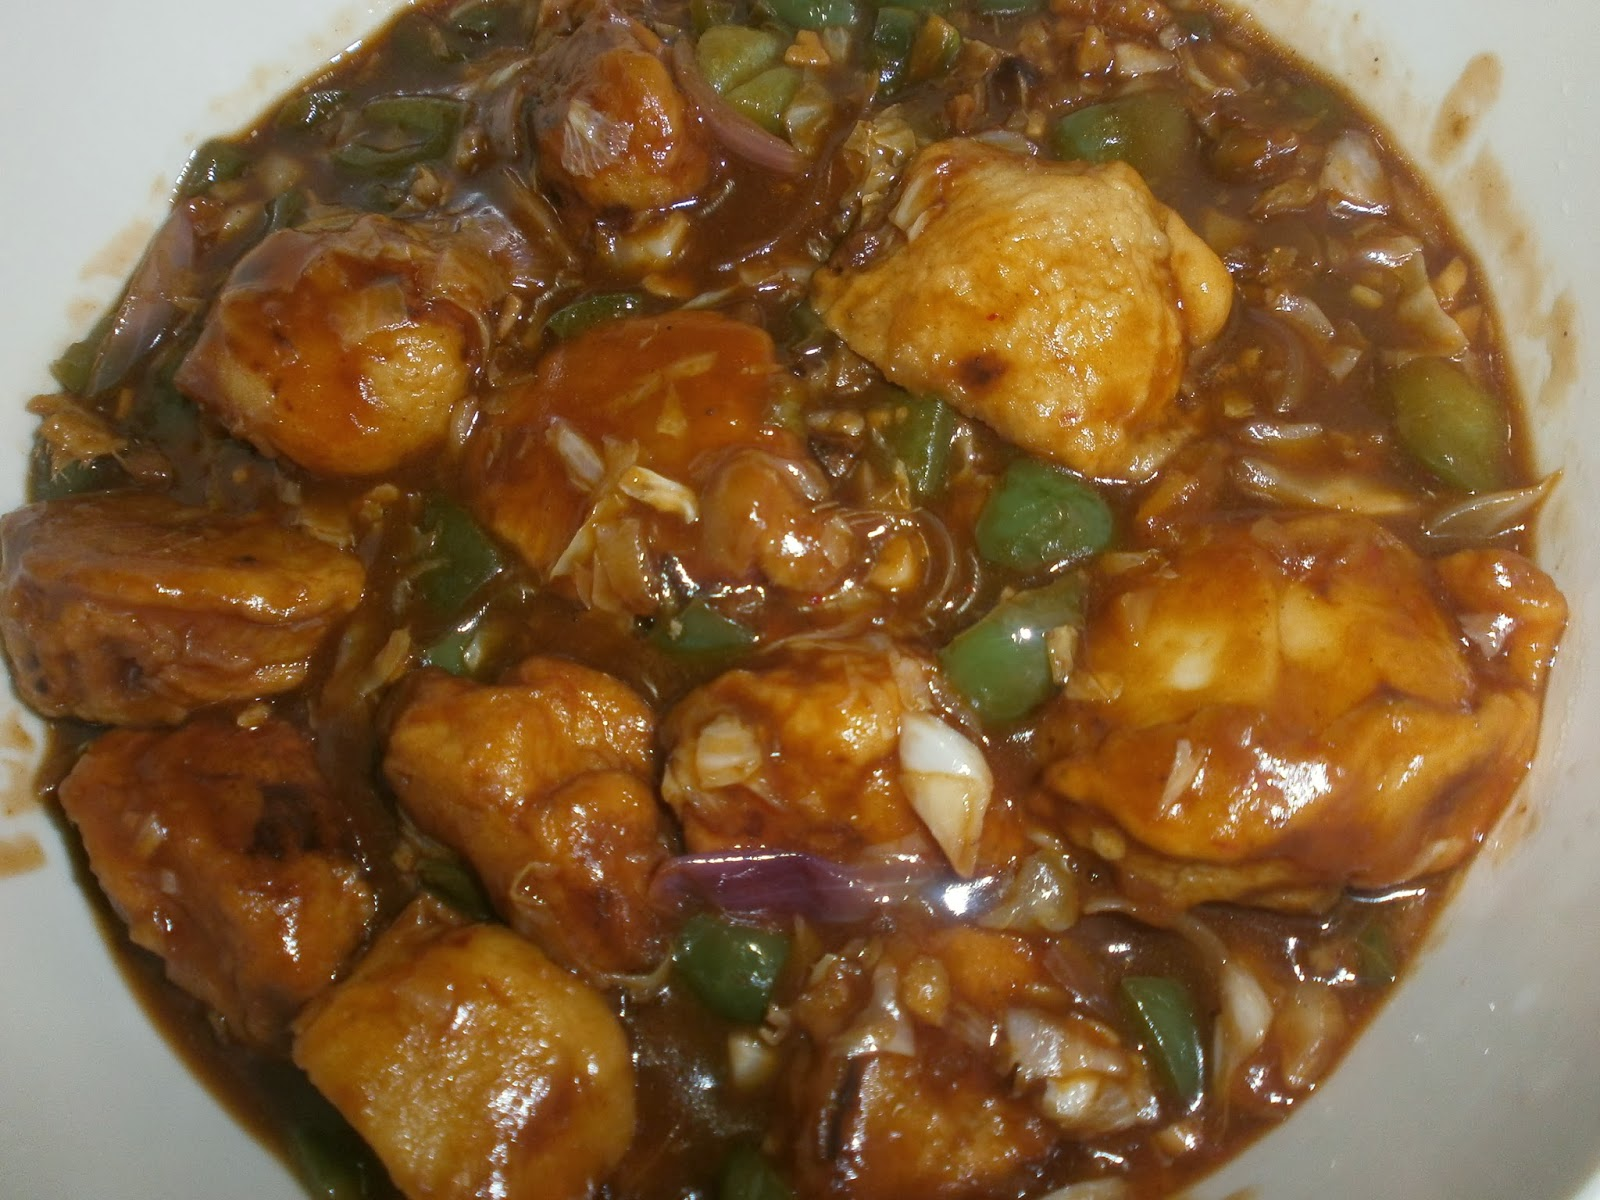 Priti recipes blog spicy and yummie chilli potato recipe spicy and yummie chilli potato recipe chinese potato recipe forumfinder Choice Image